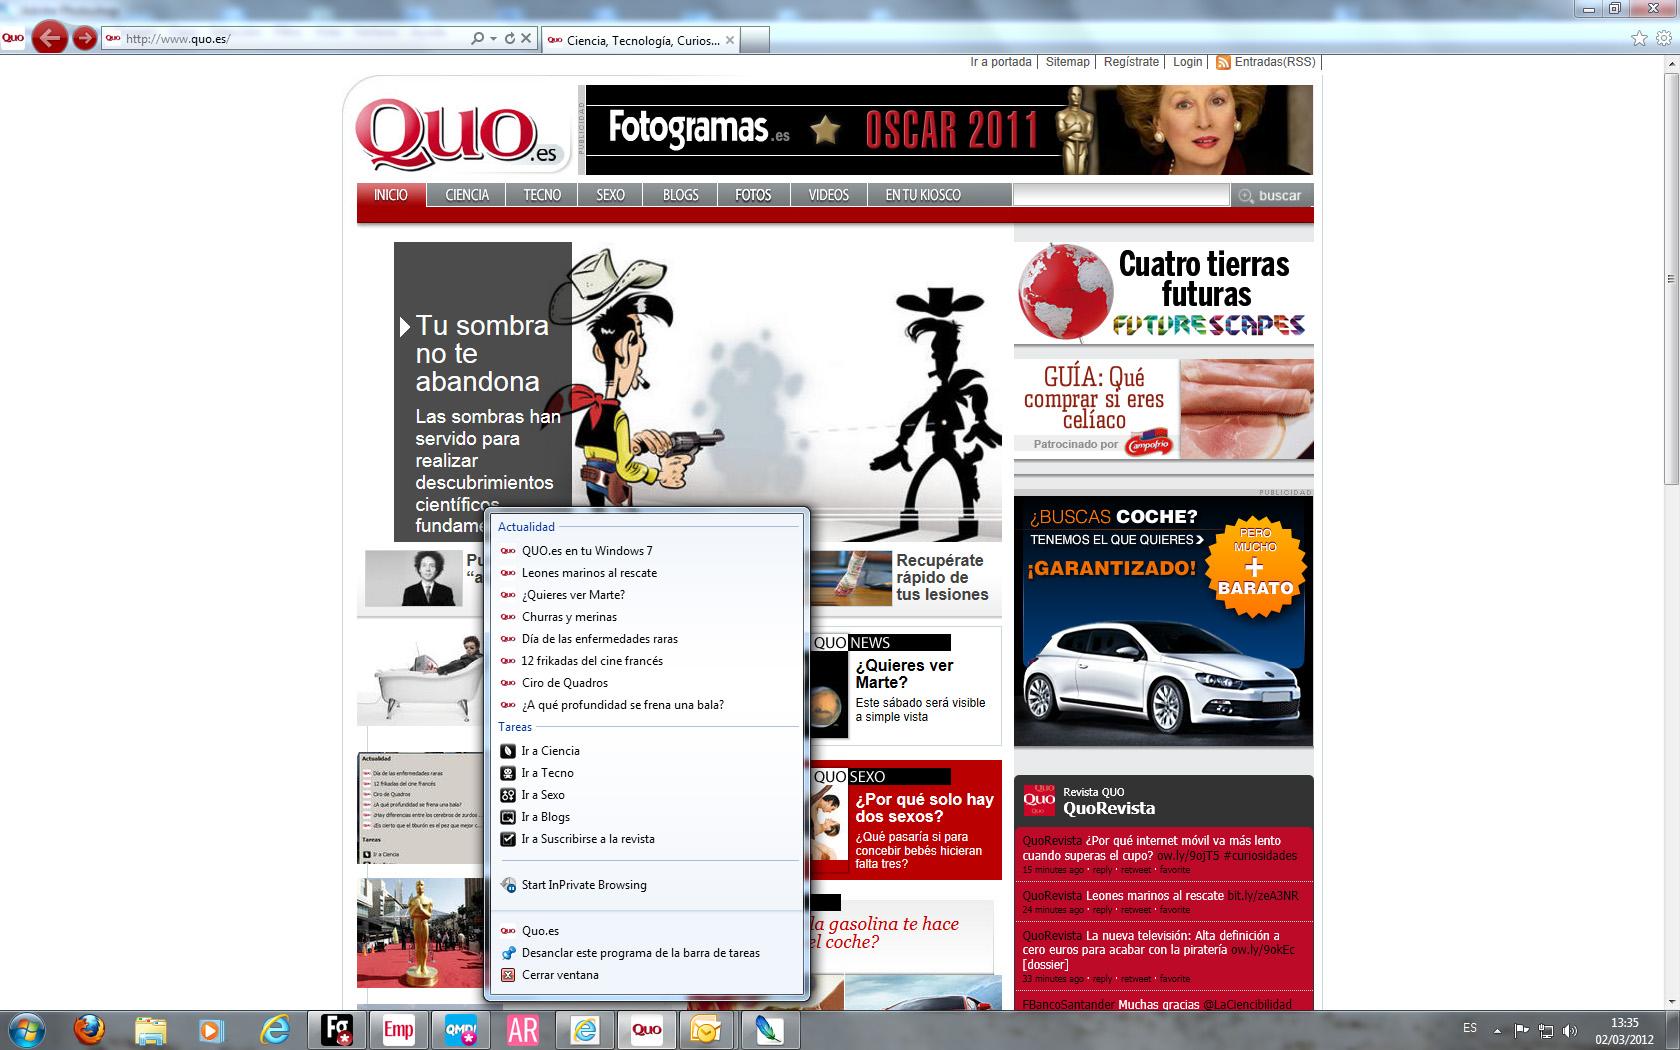 QUO.es en tu Windows 7